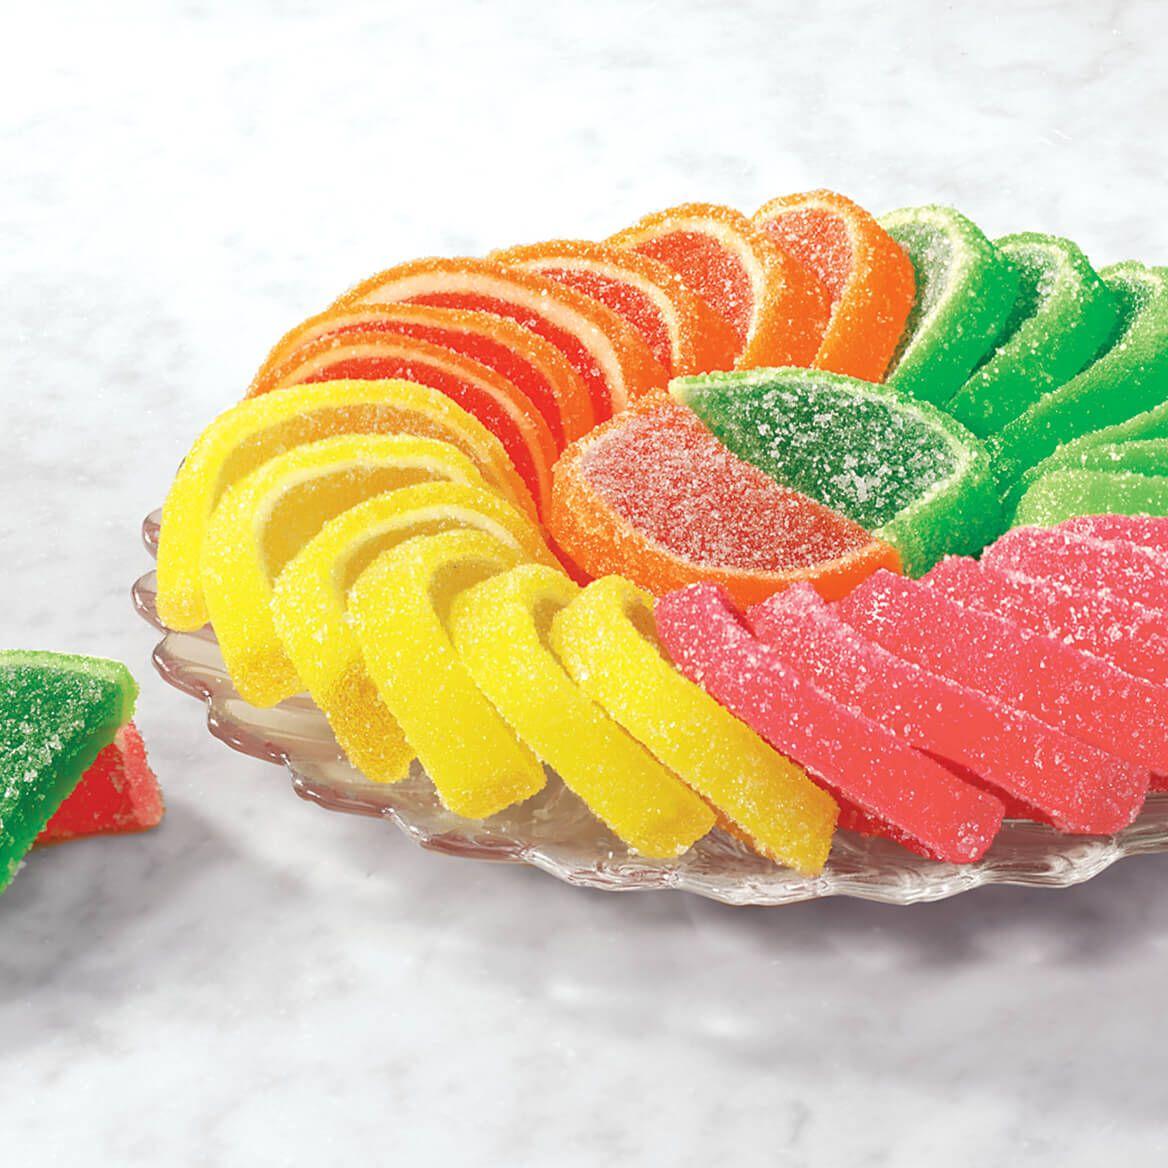 Fruit Slices, 11 oz.-315154